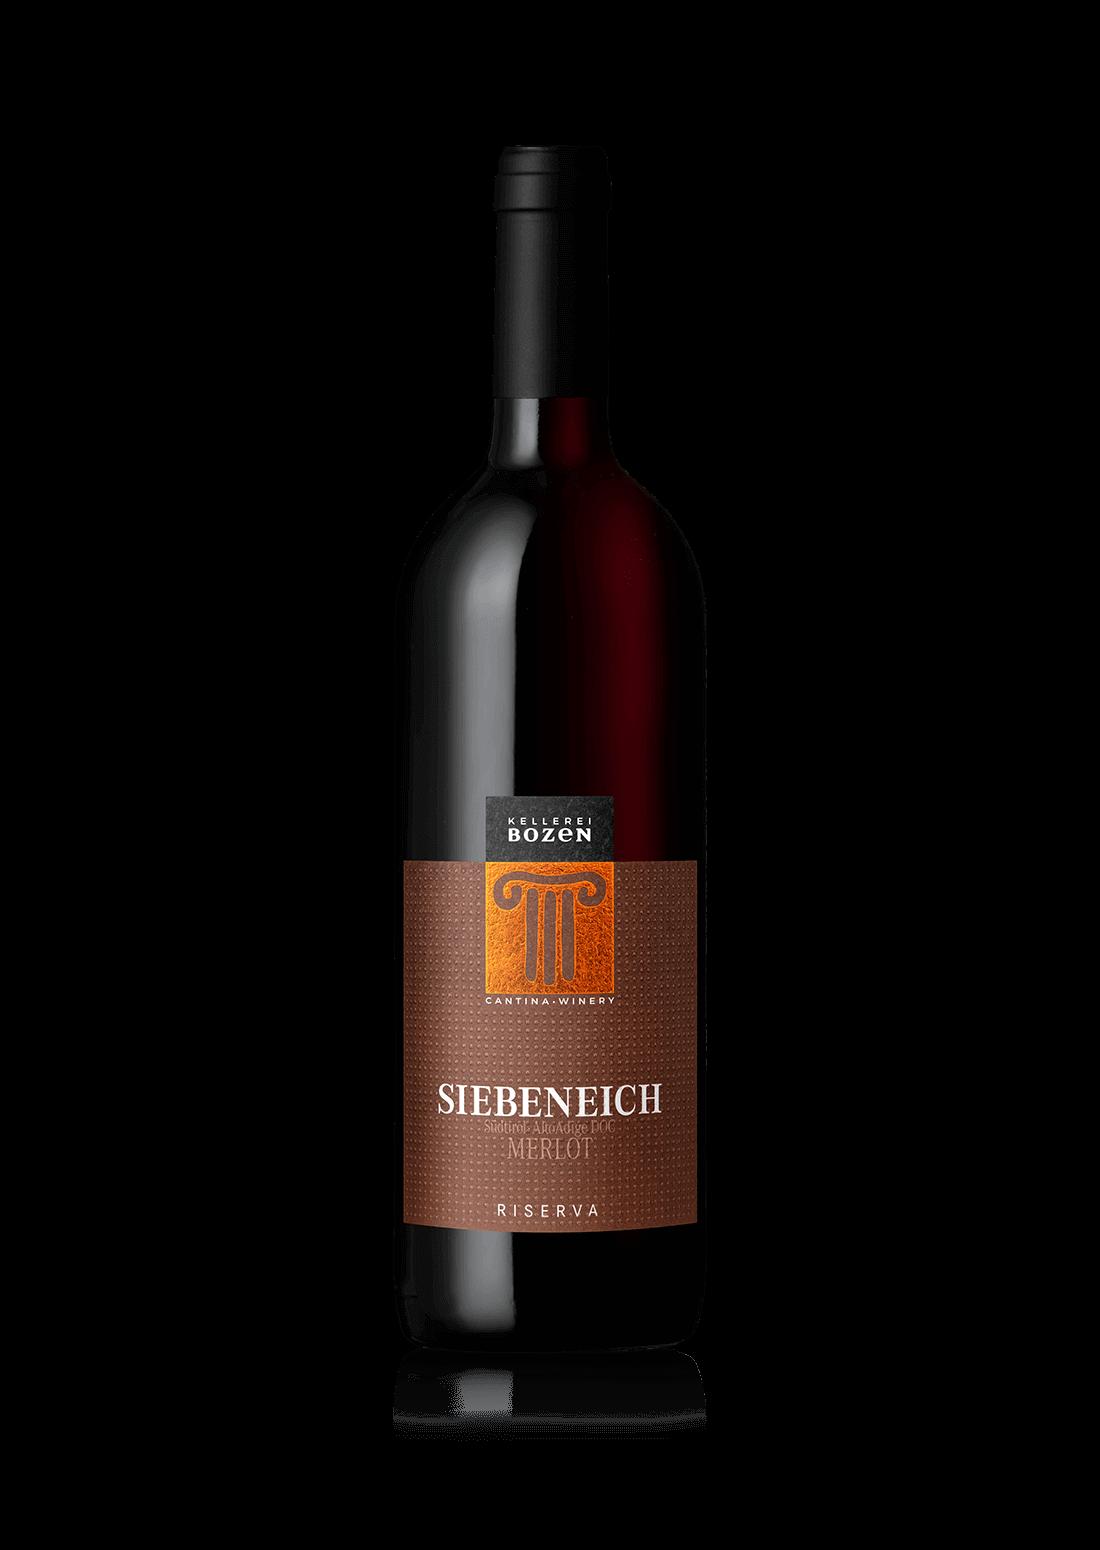 Magnum SIEBENEICH MERLOT RISERVA Südtirol • Alto Adige DOC 2017